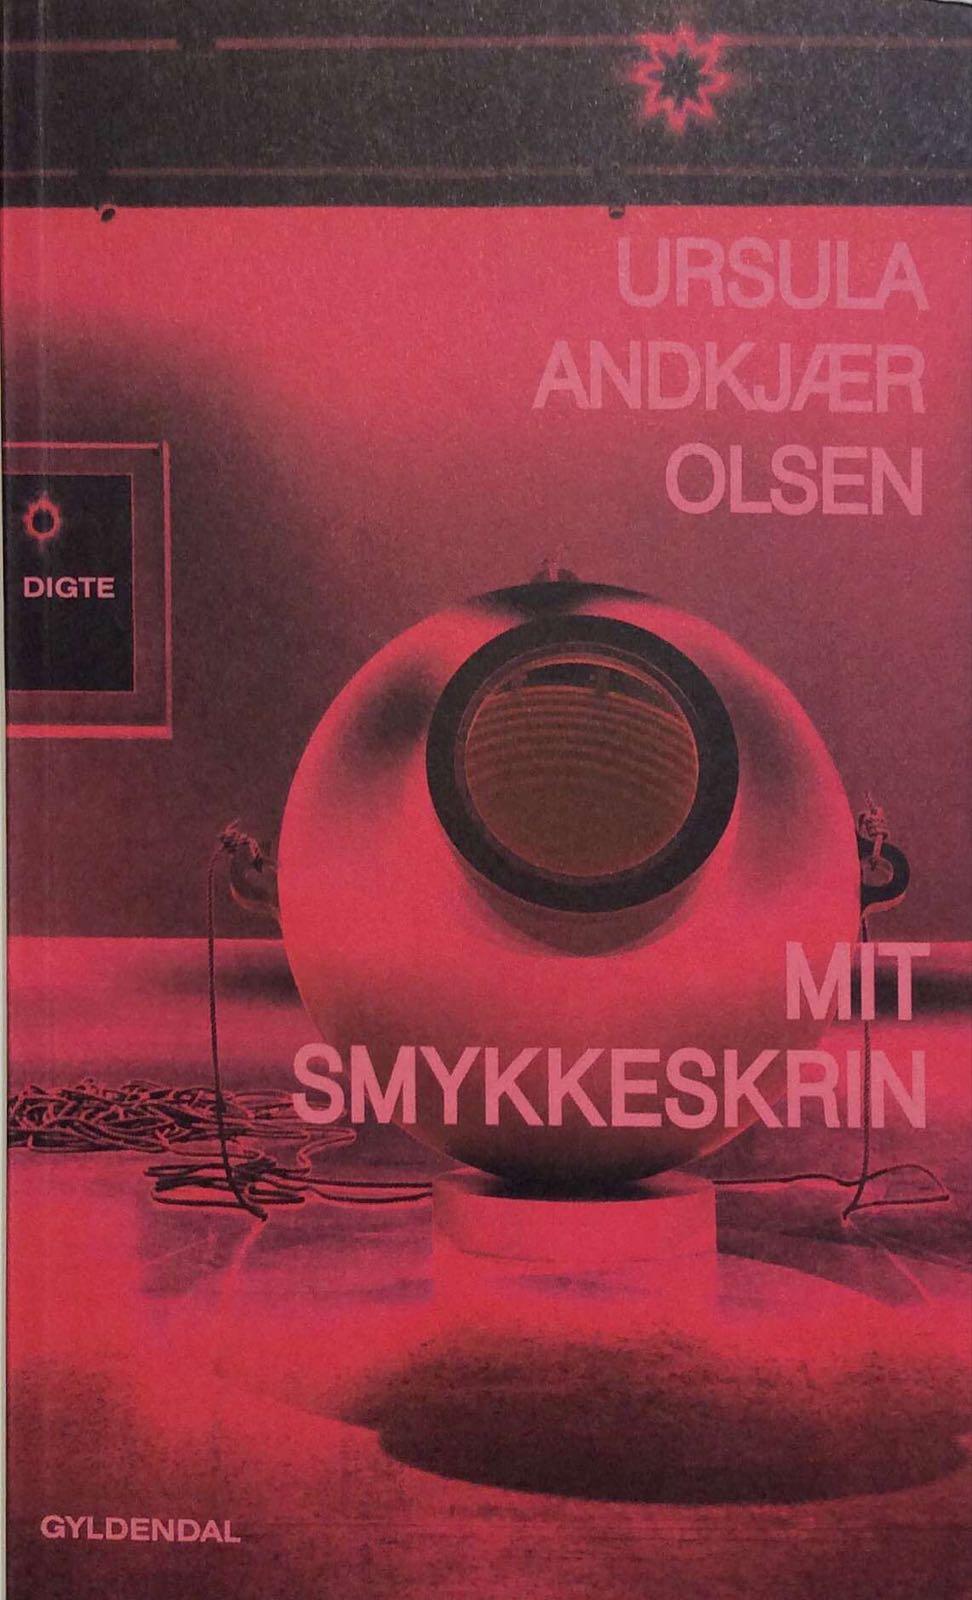 Olsen, Ursula Andkær. Mit smykkeskrin